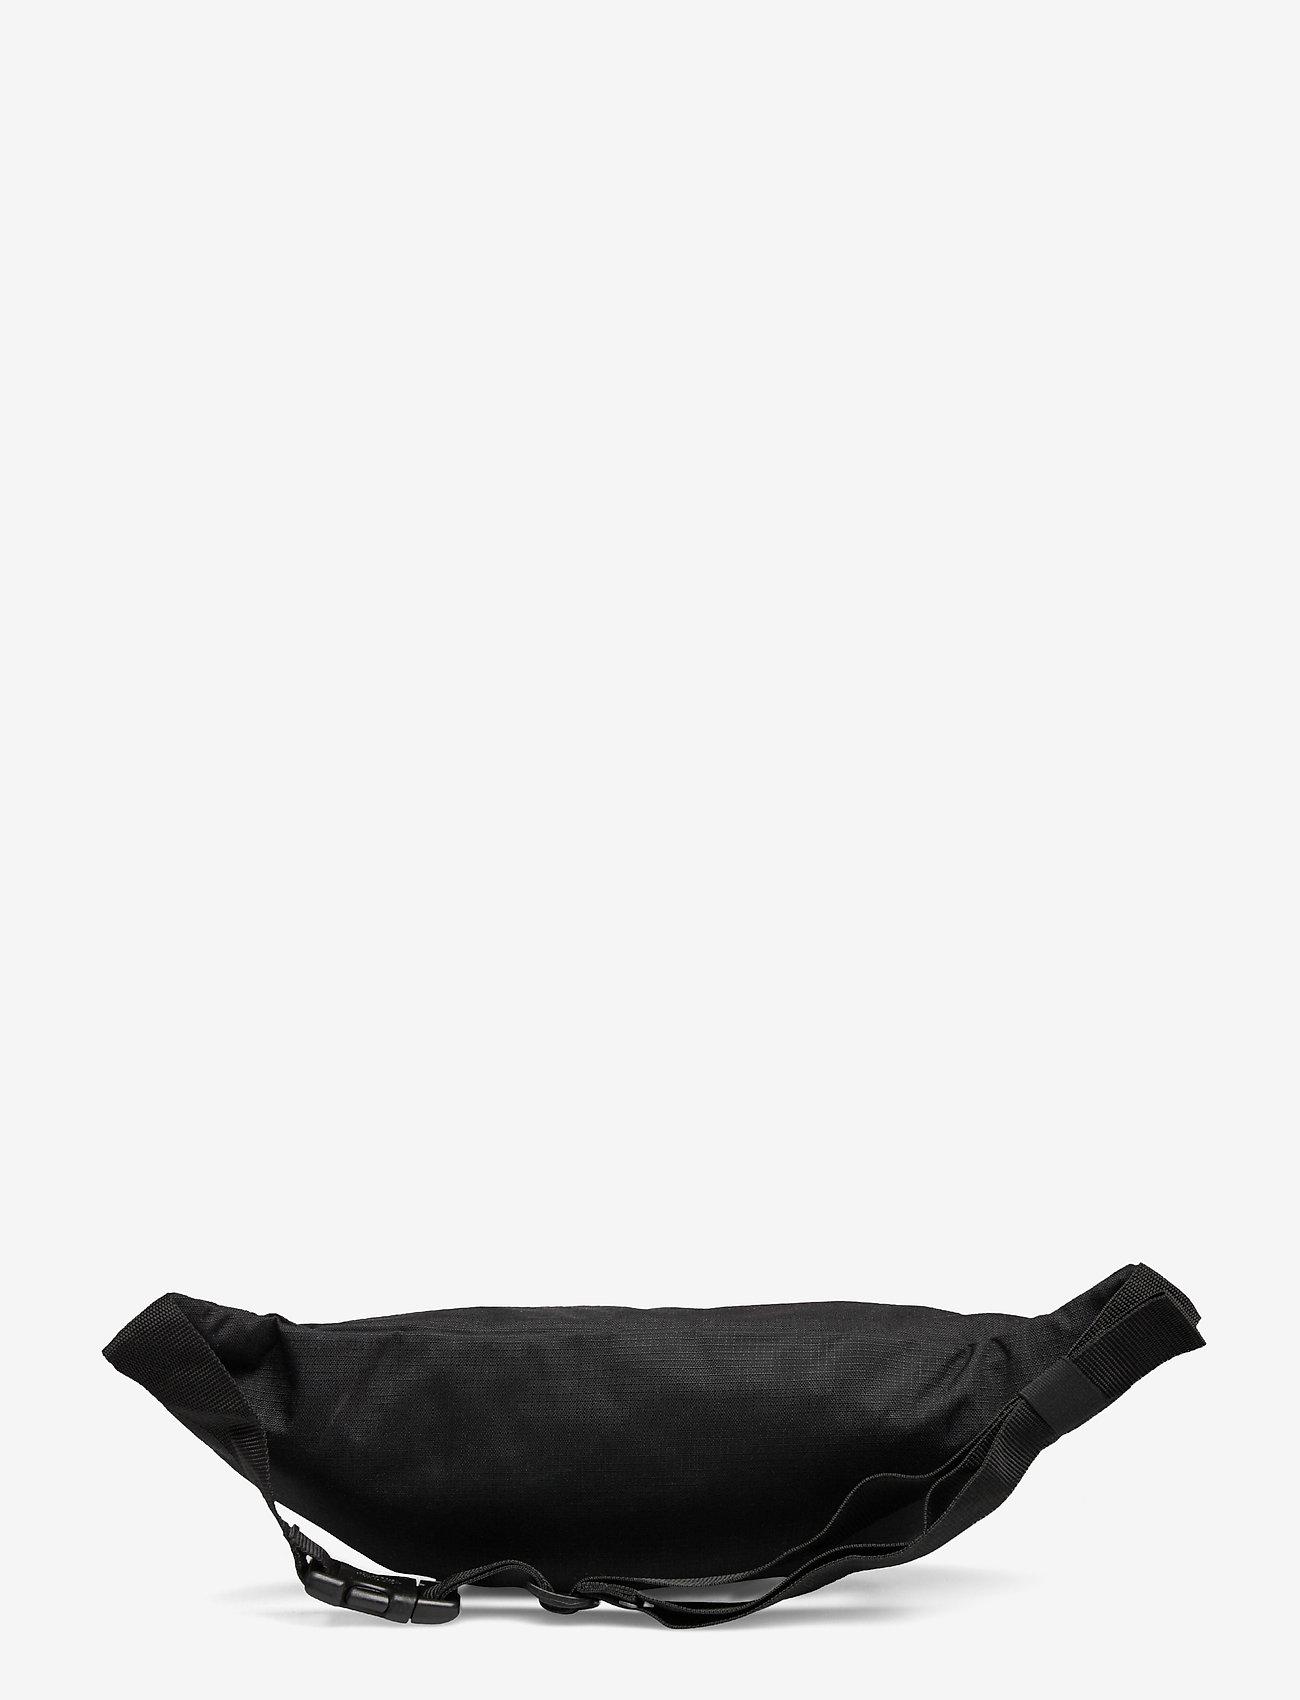 VANS - WARD CROSS BODY PACK - tassen - black ripstop - 1